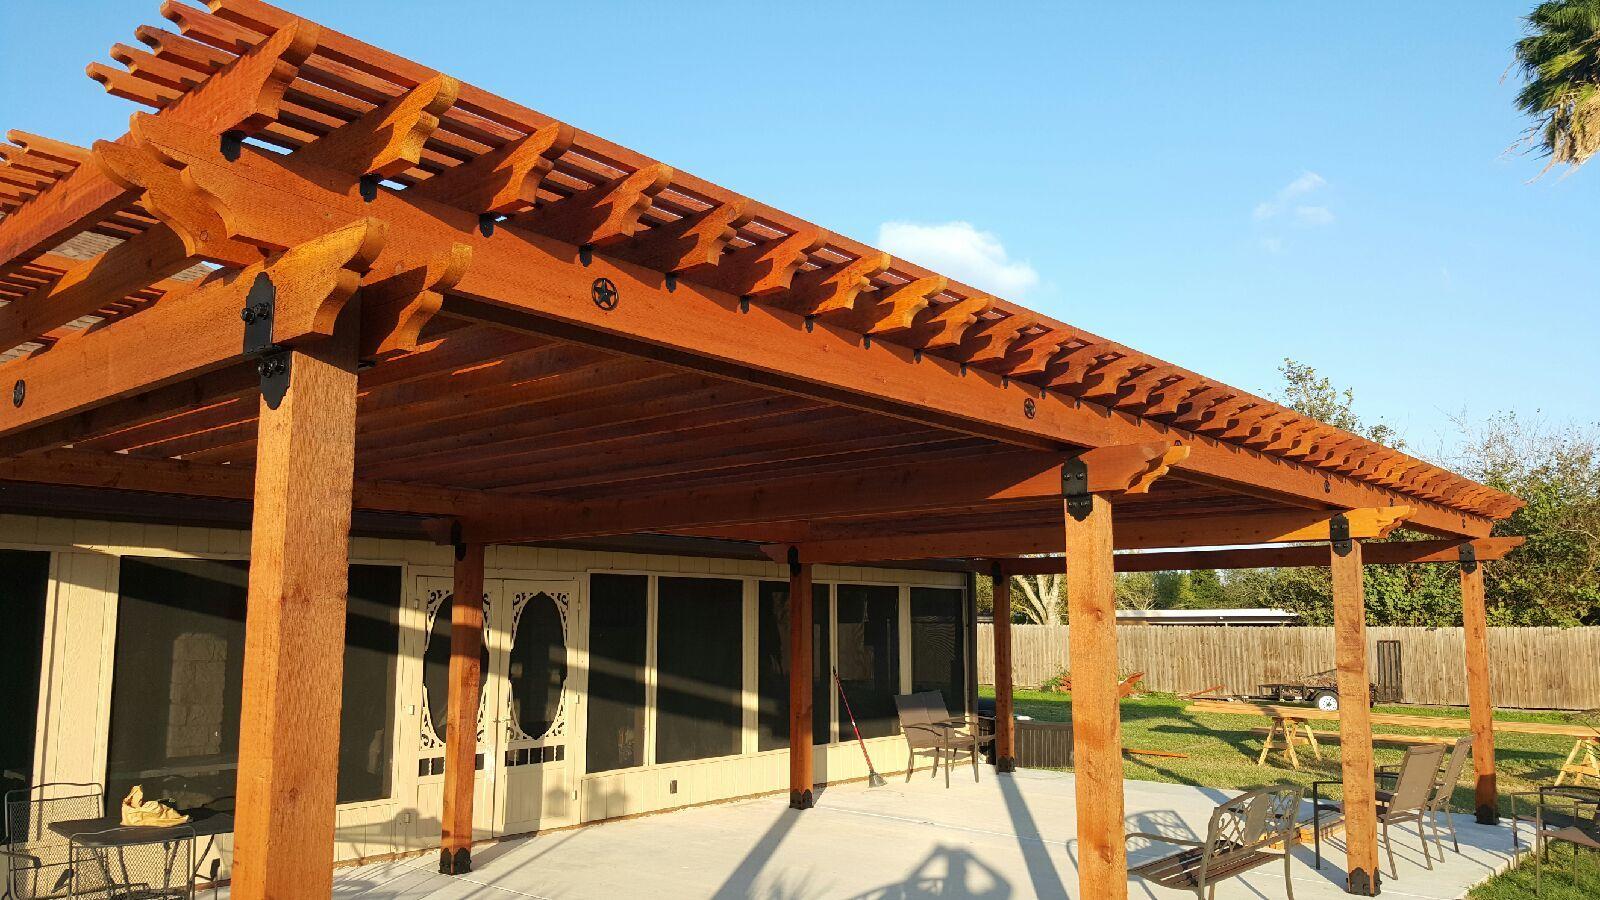 Idea by OZCO Building Products on Pergolas & Arbors